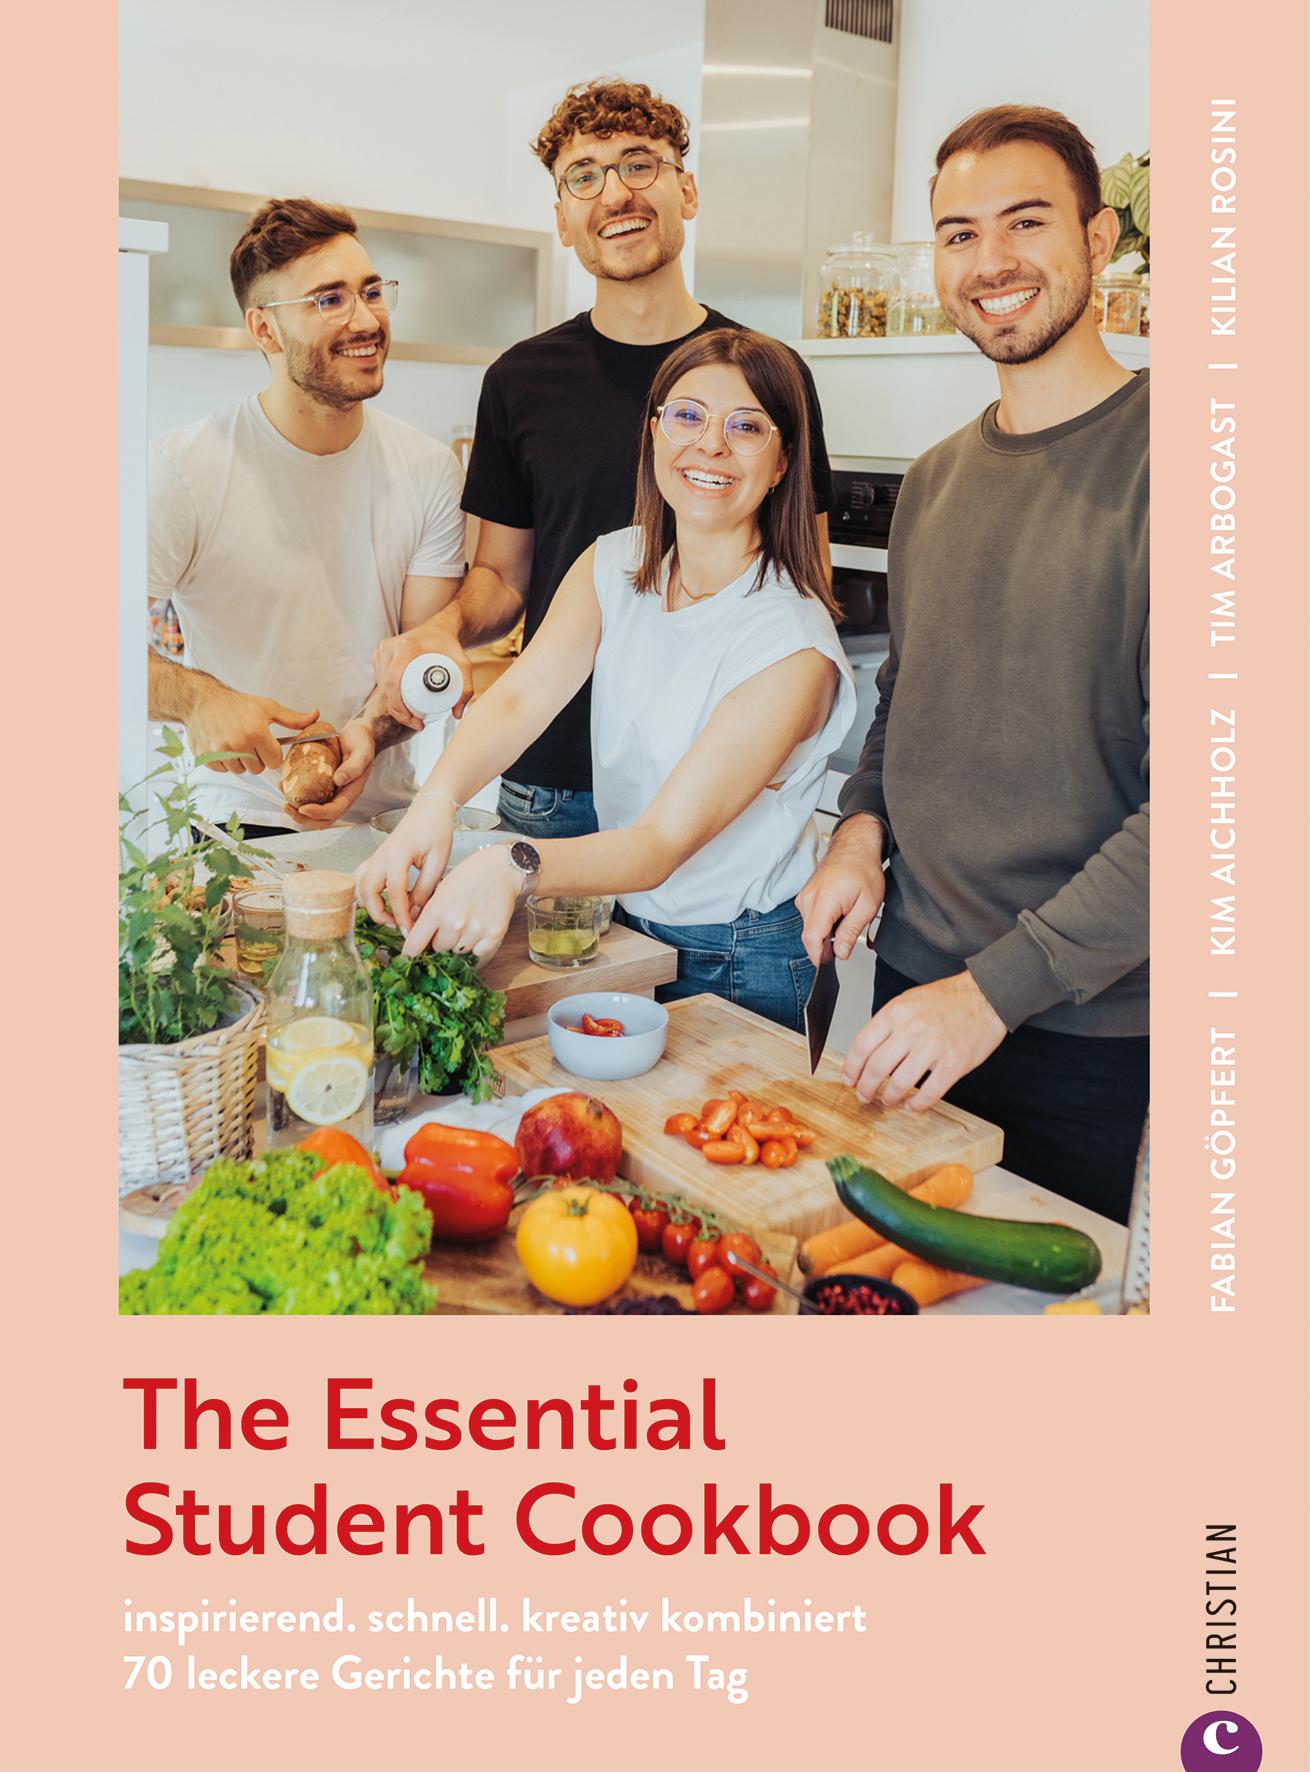 The Essential Student Cookbook